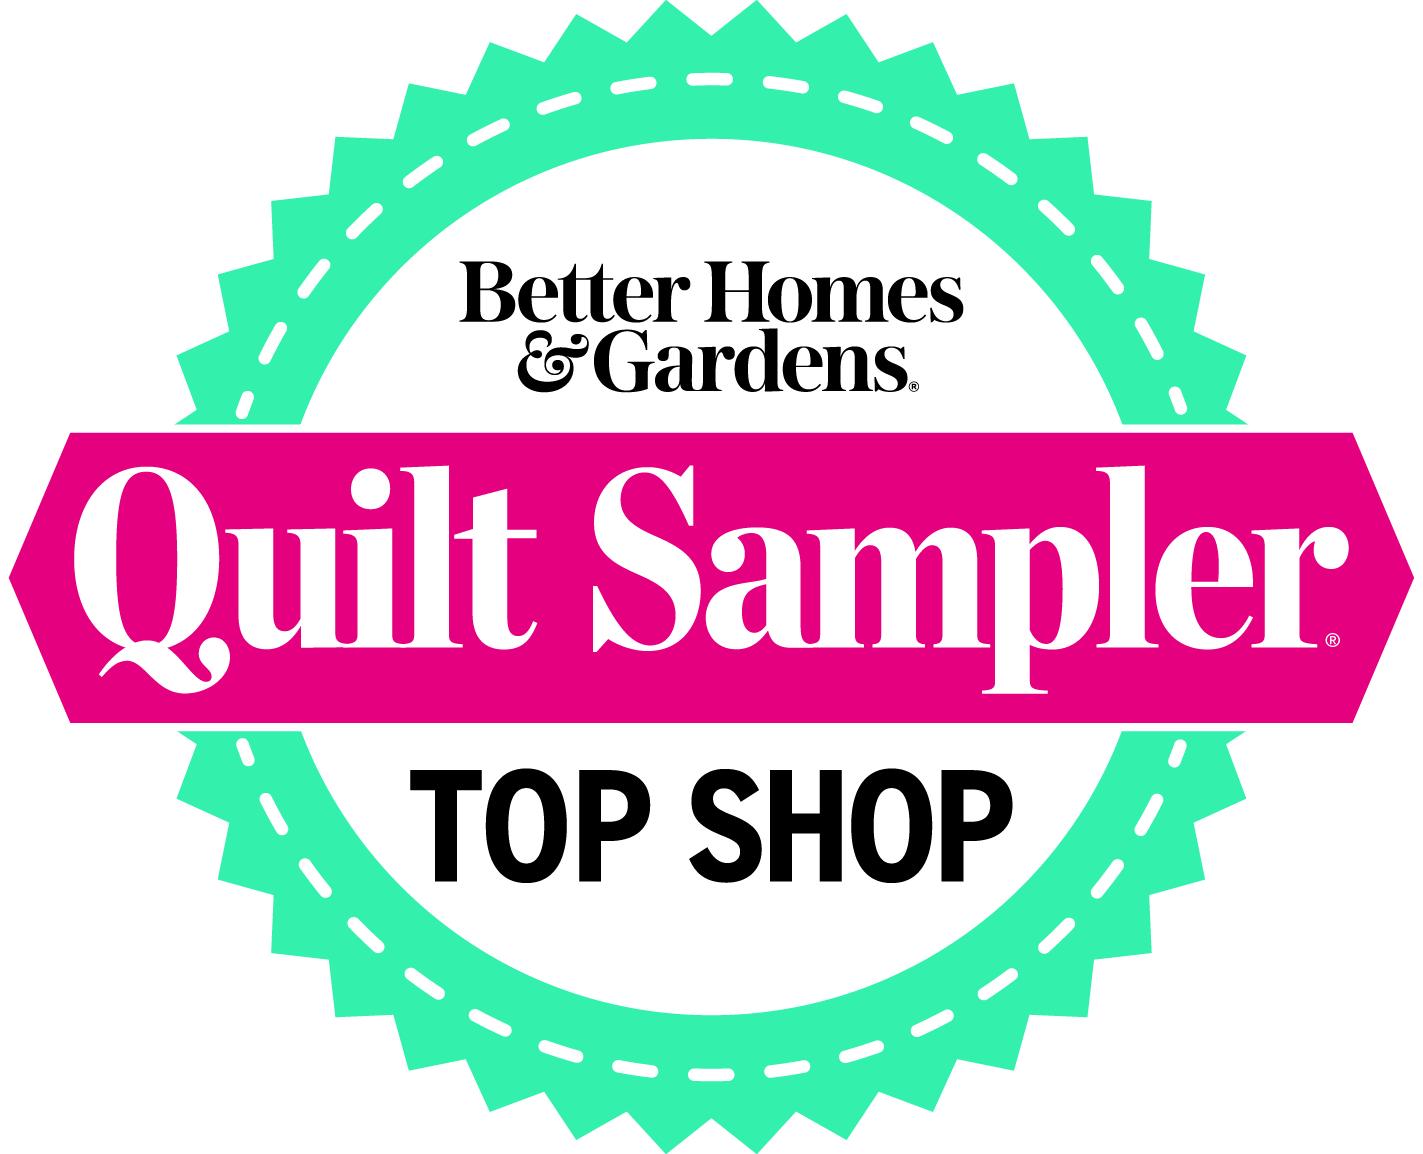 Top Shop Logo Color